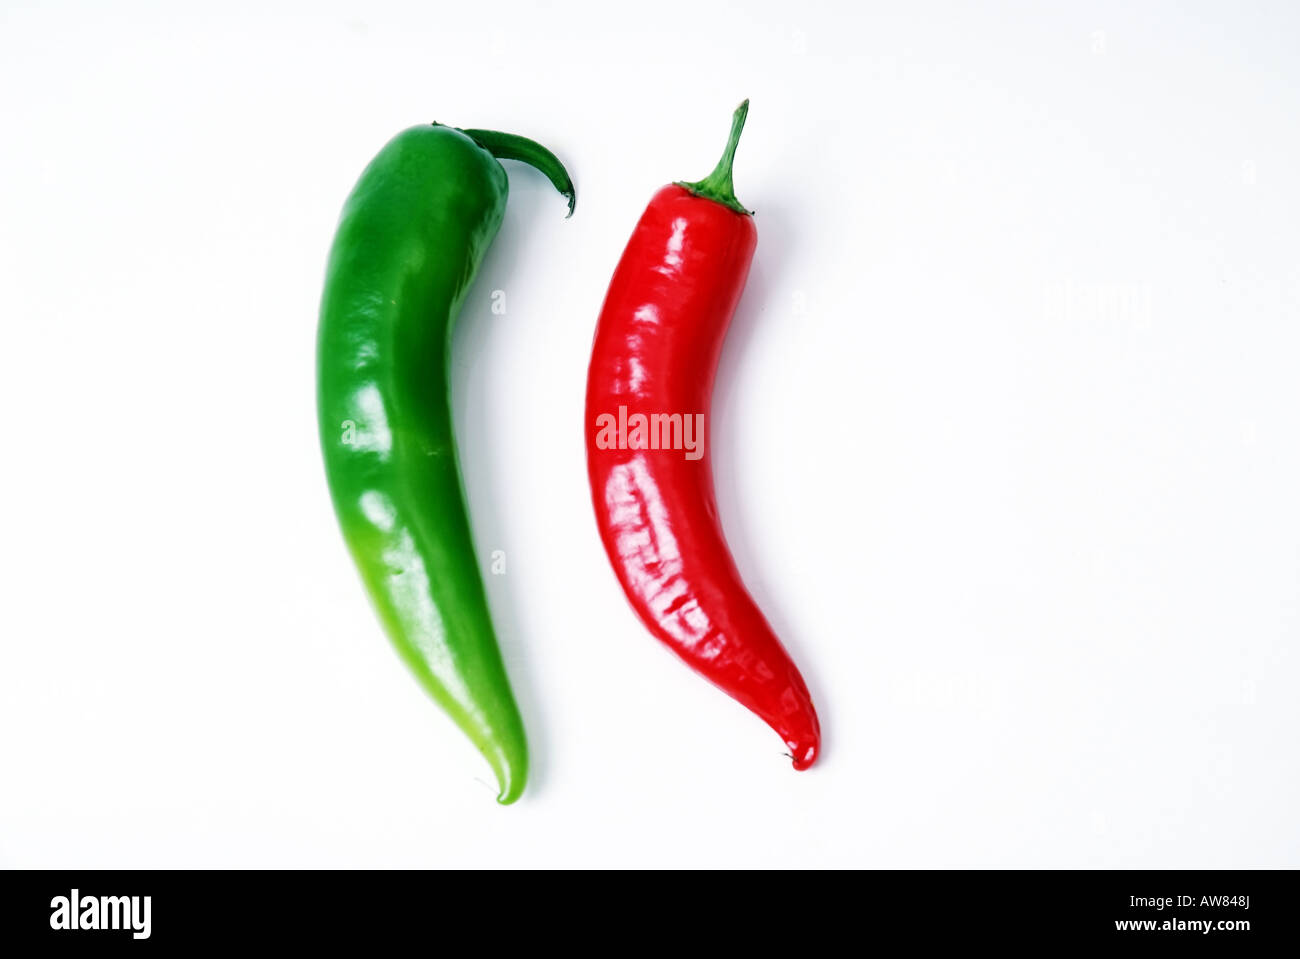 A Green and a Red Chili Gruen und rote Chilischote Stock Photo